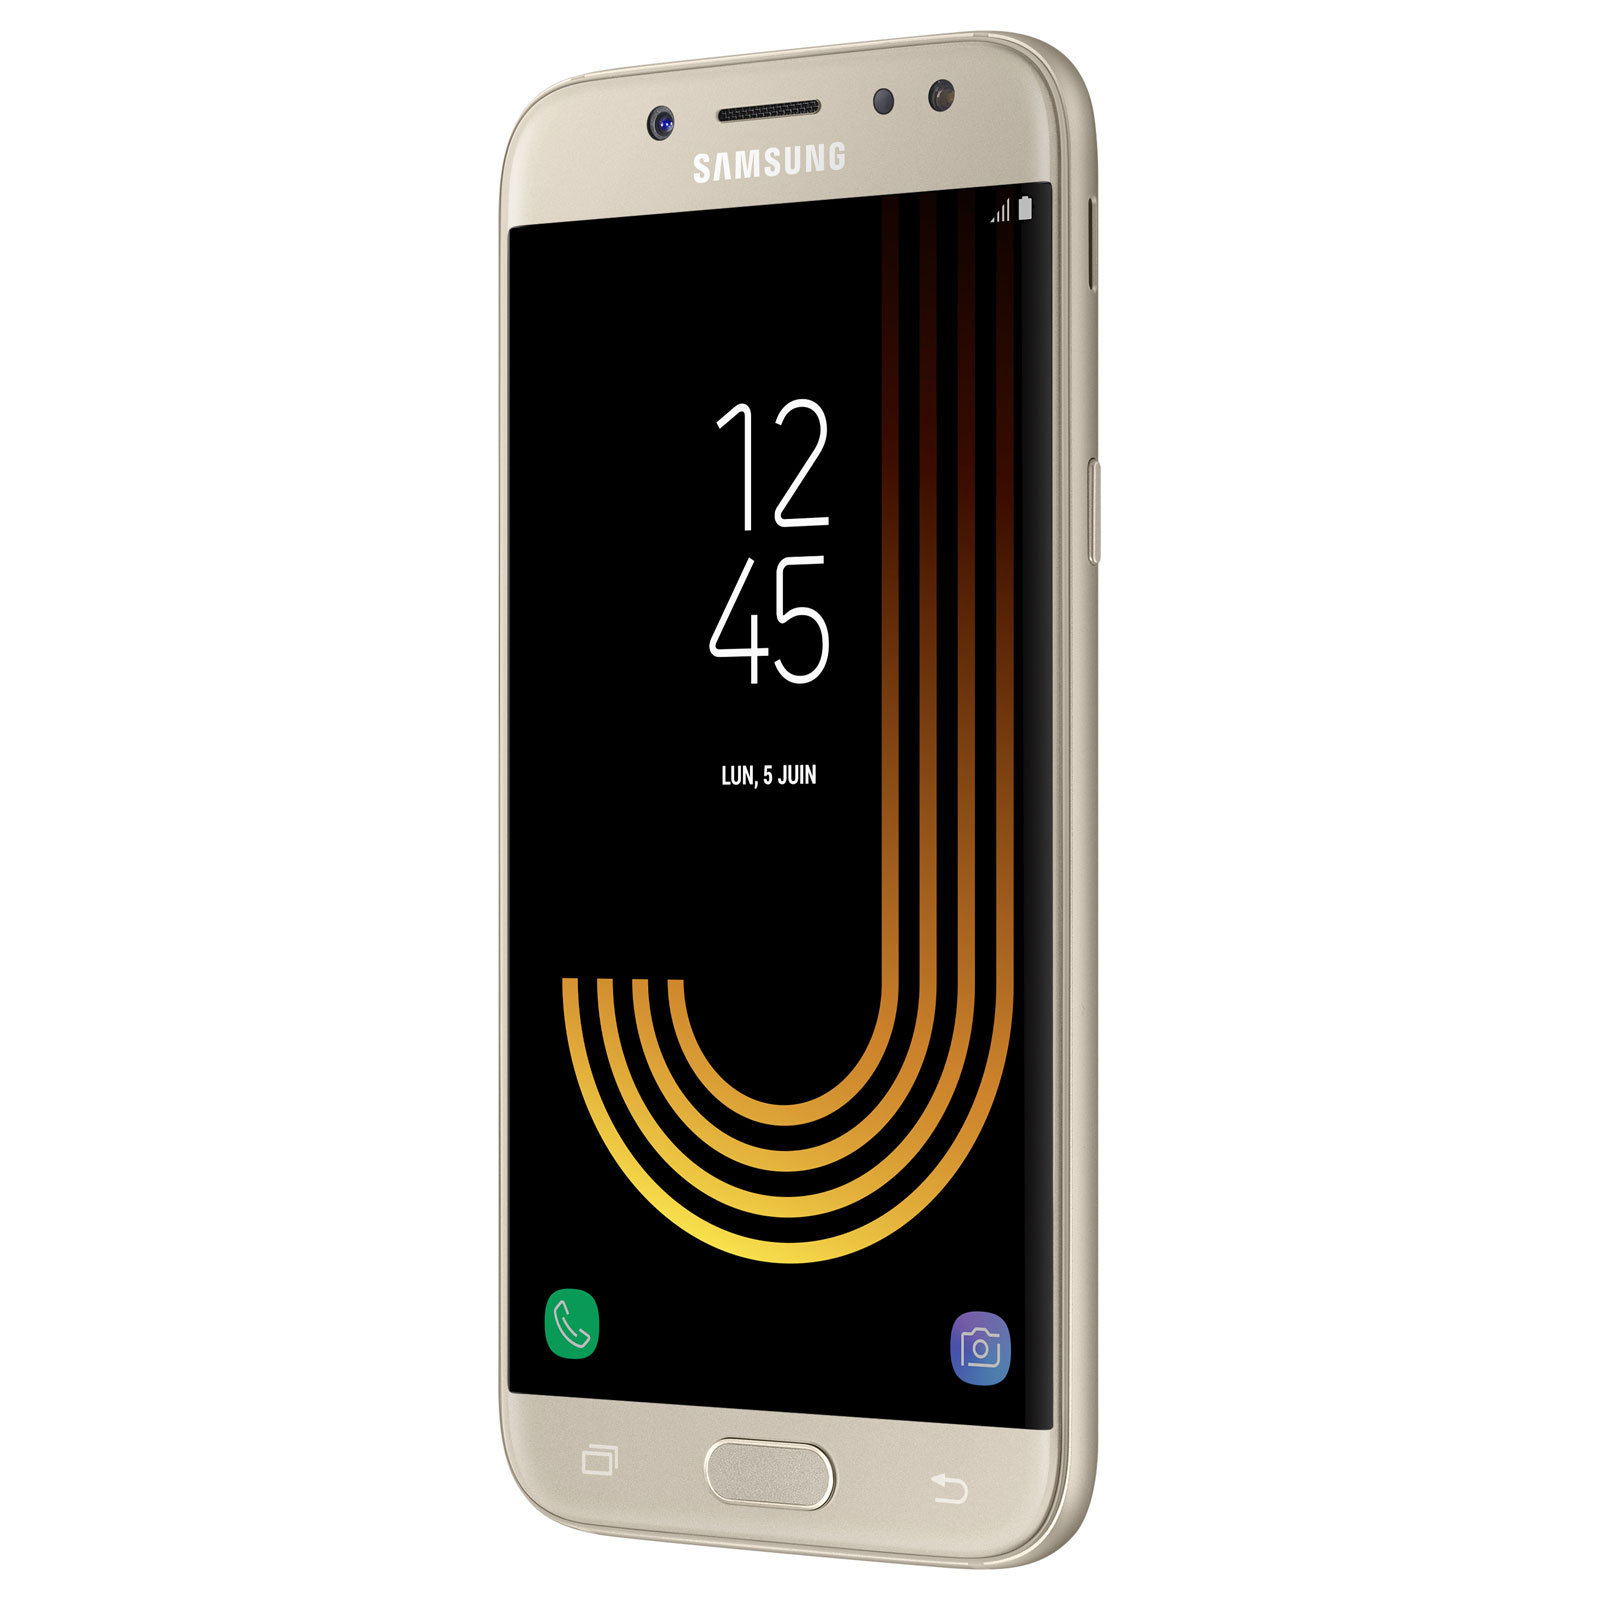 Samsung Galaxy J5 (2017) 16Go J530 Gold (SM-J530FZDAXEF) - Achat / Vente Téléphonie sur Cybertek.fr - 3